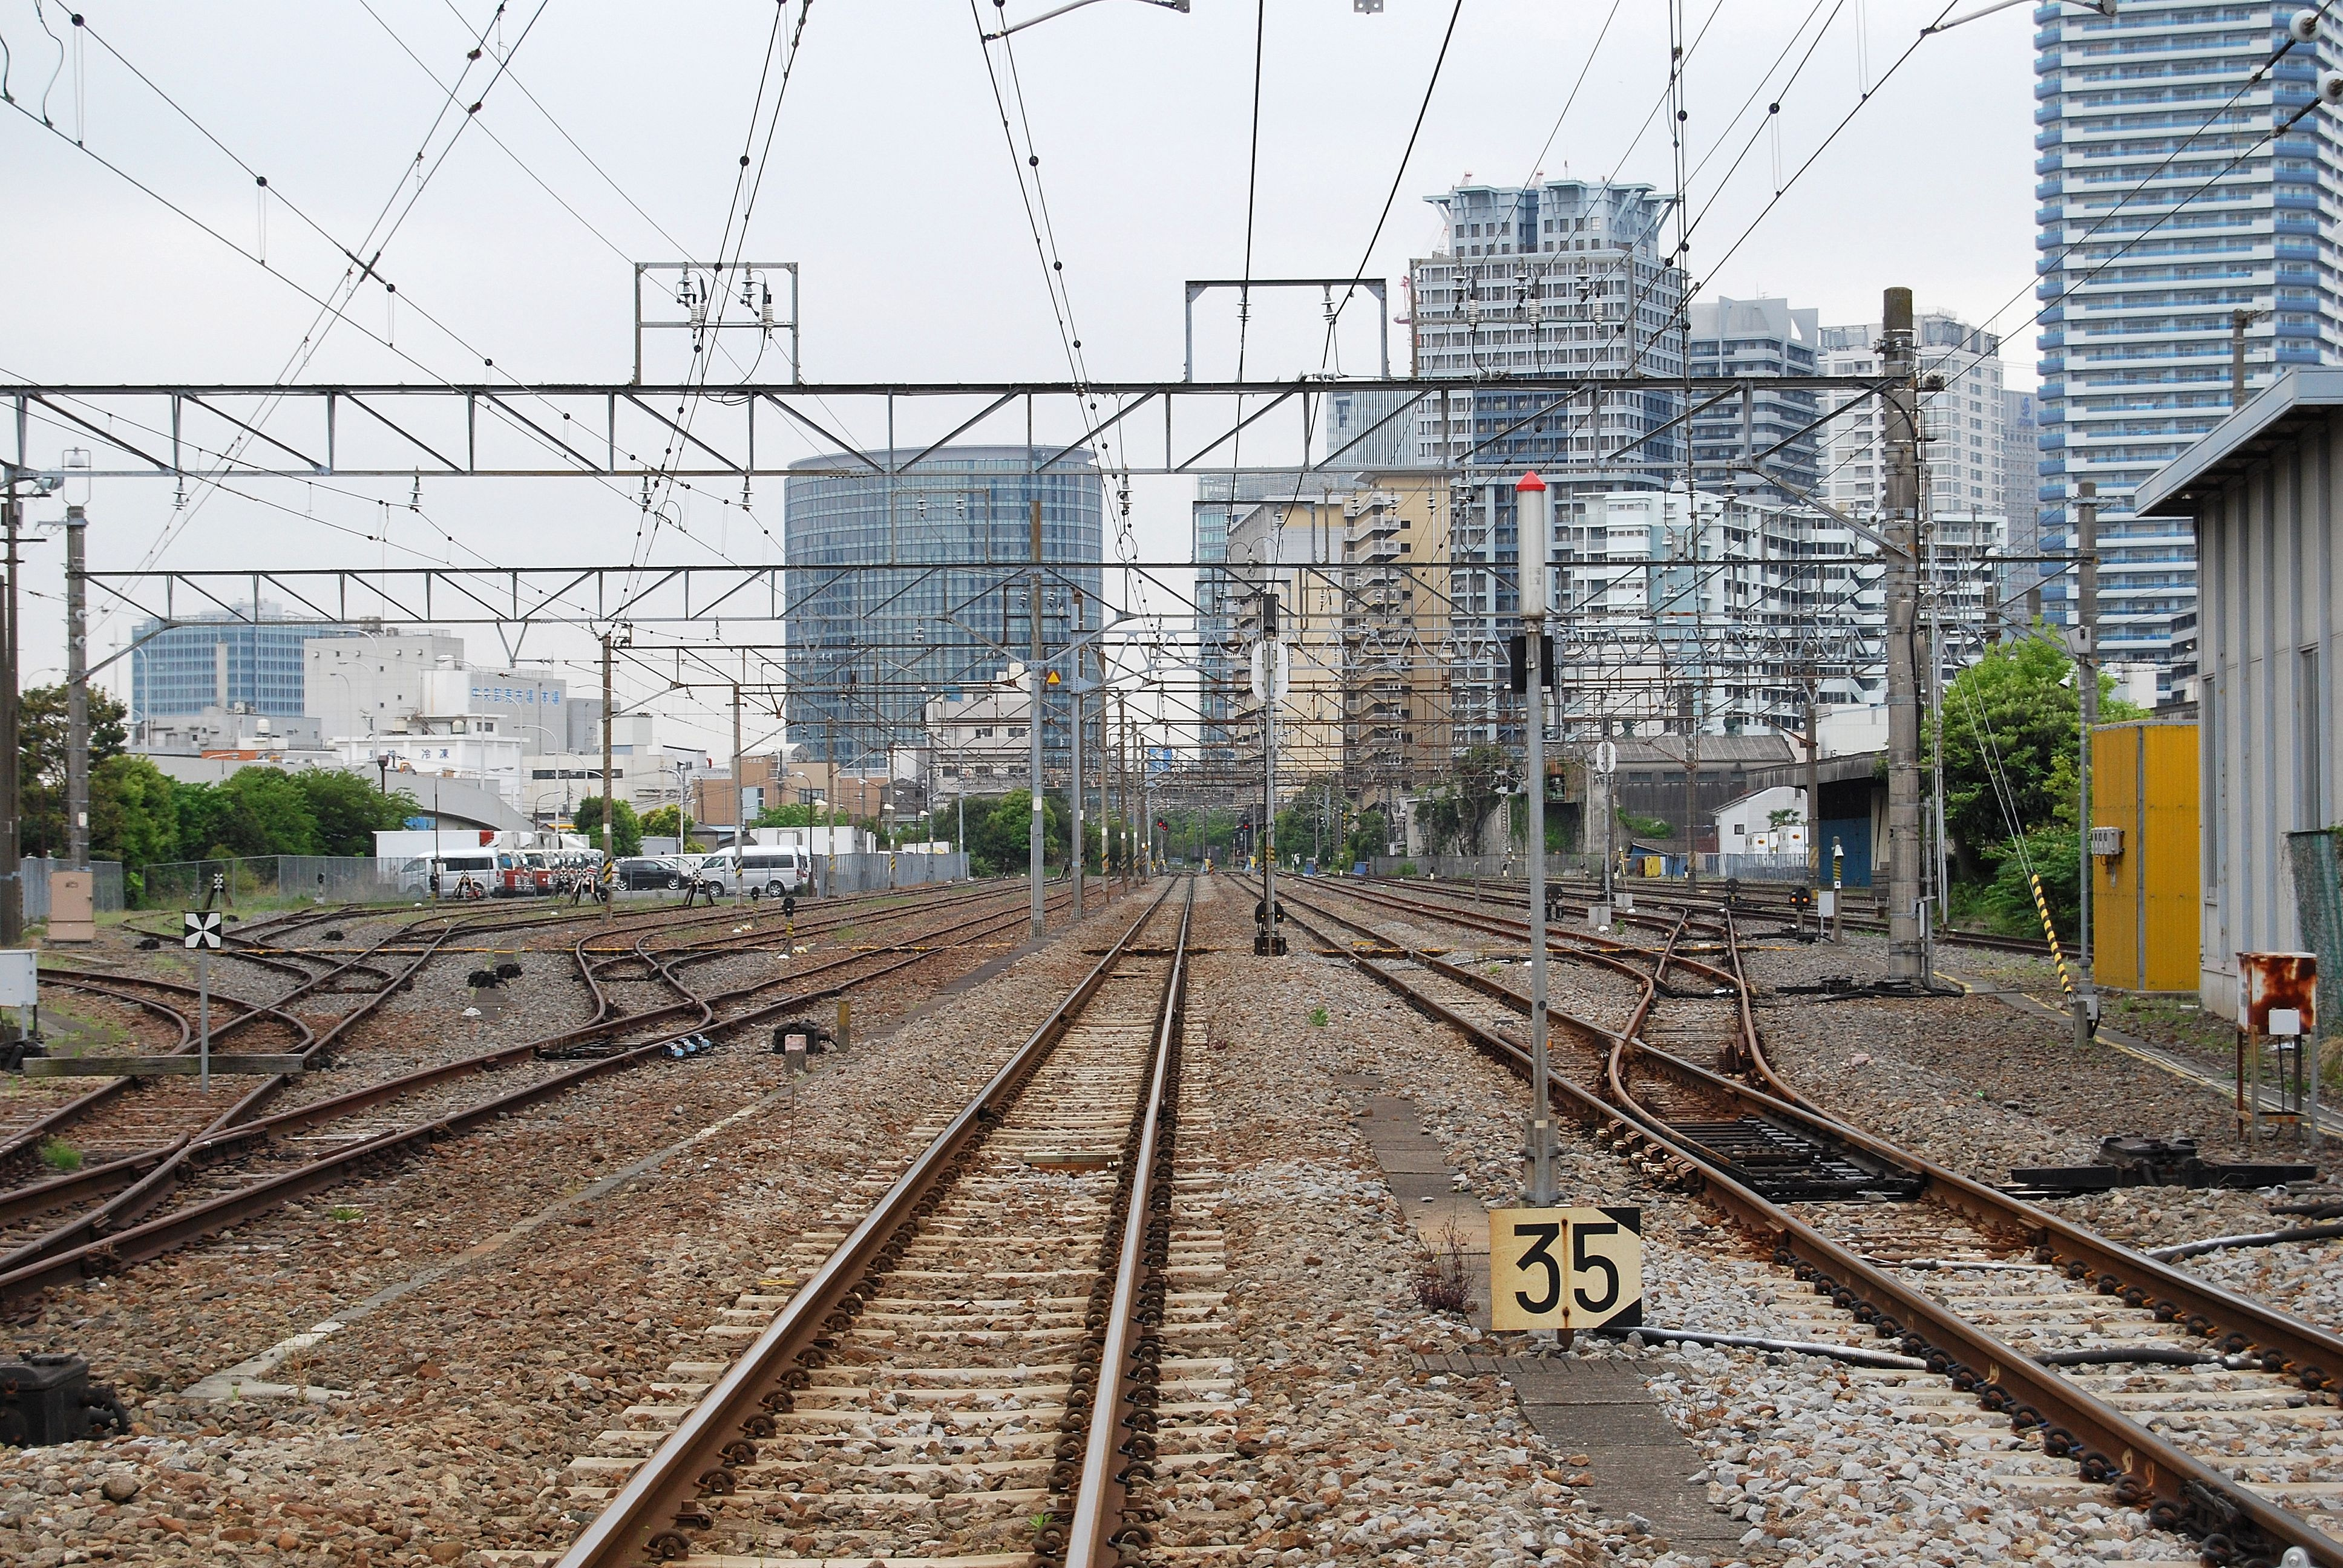 https://upload.wikimedia.org/wikipedia/commons/d/de/Higashi_takashima_station.JPG